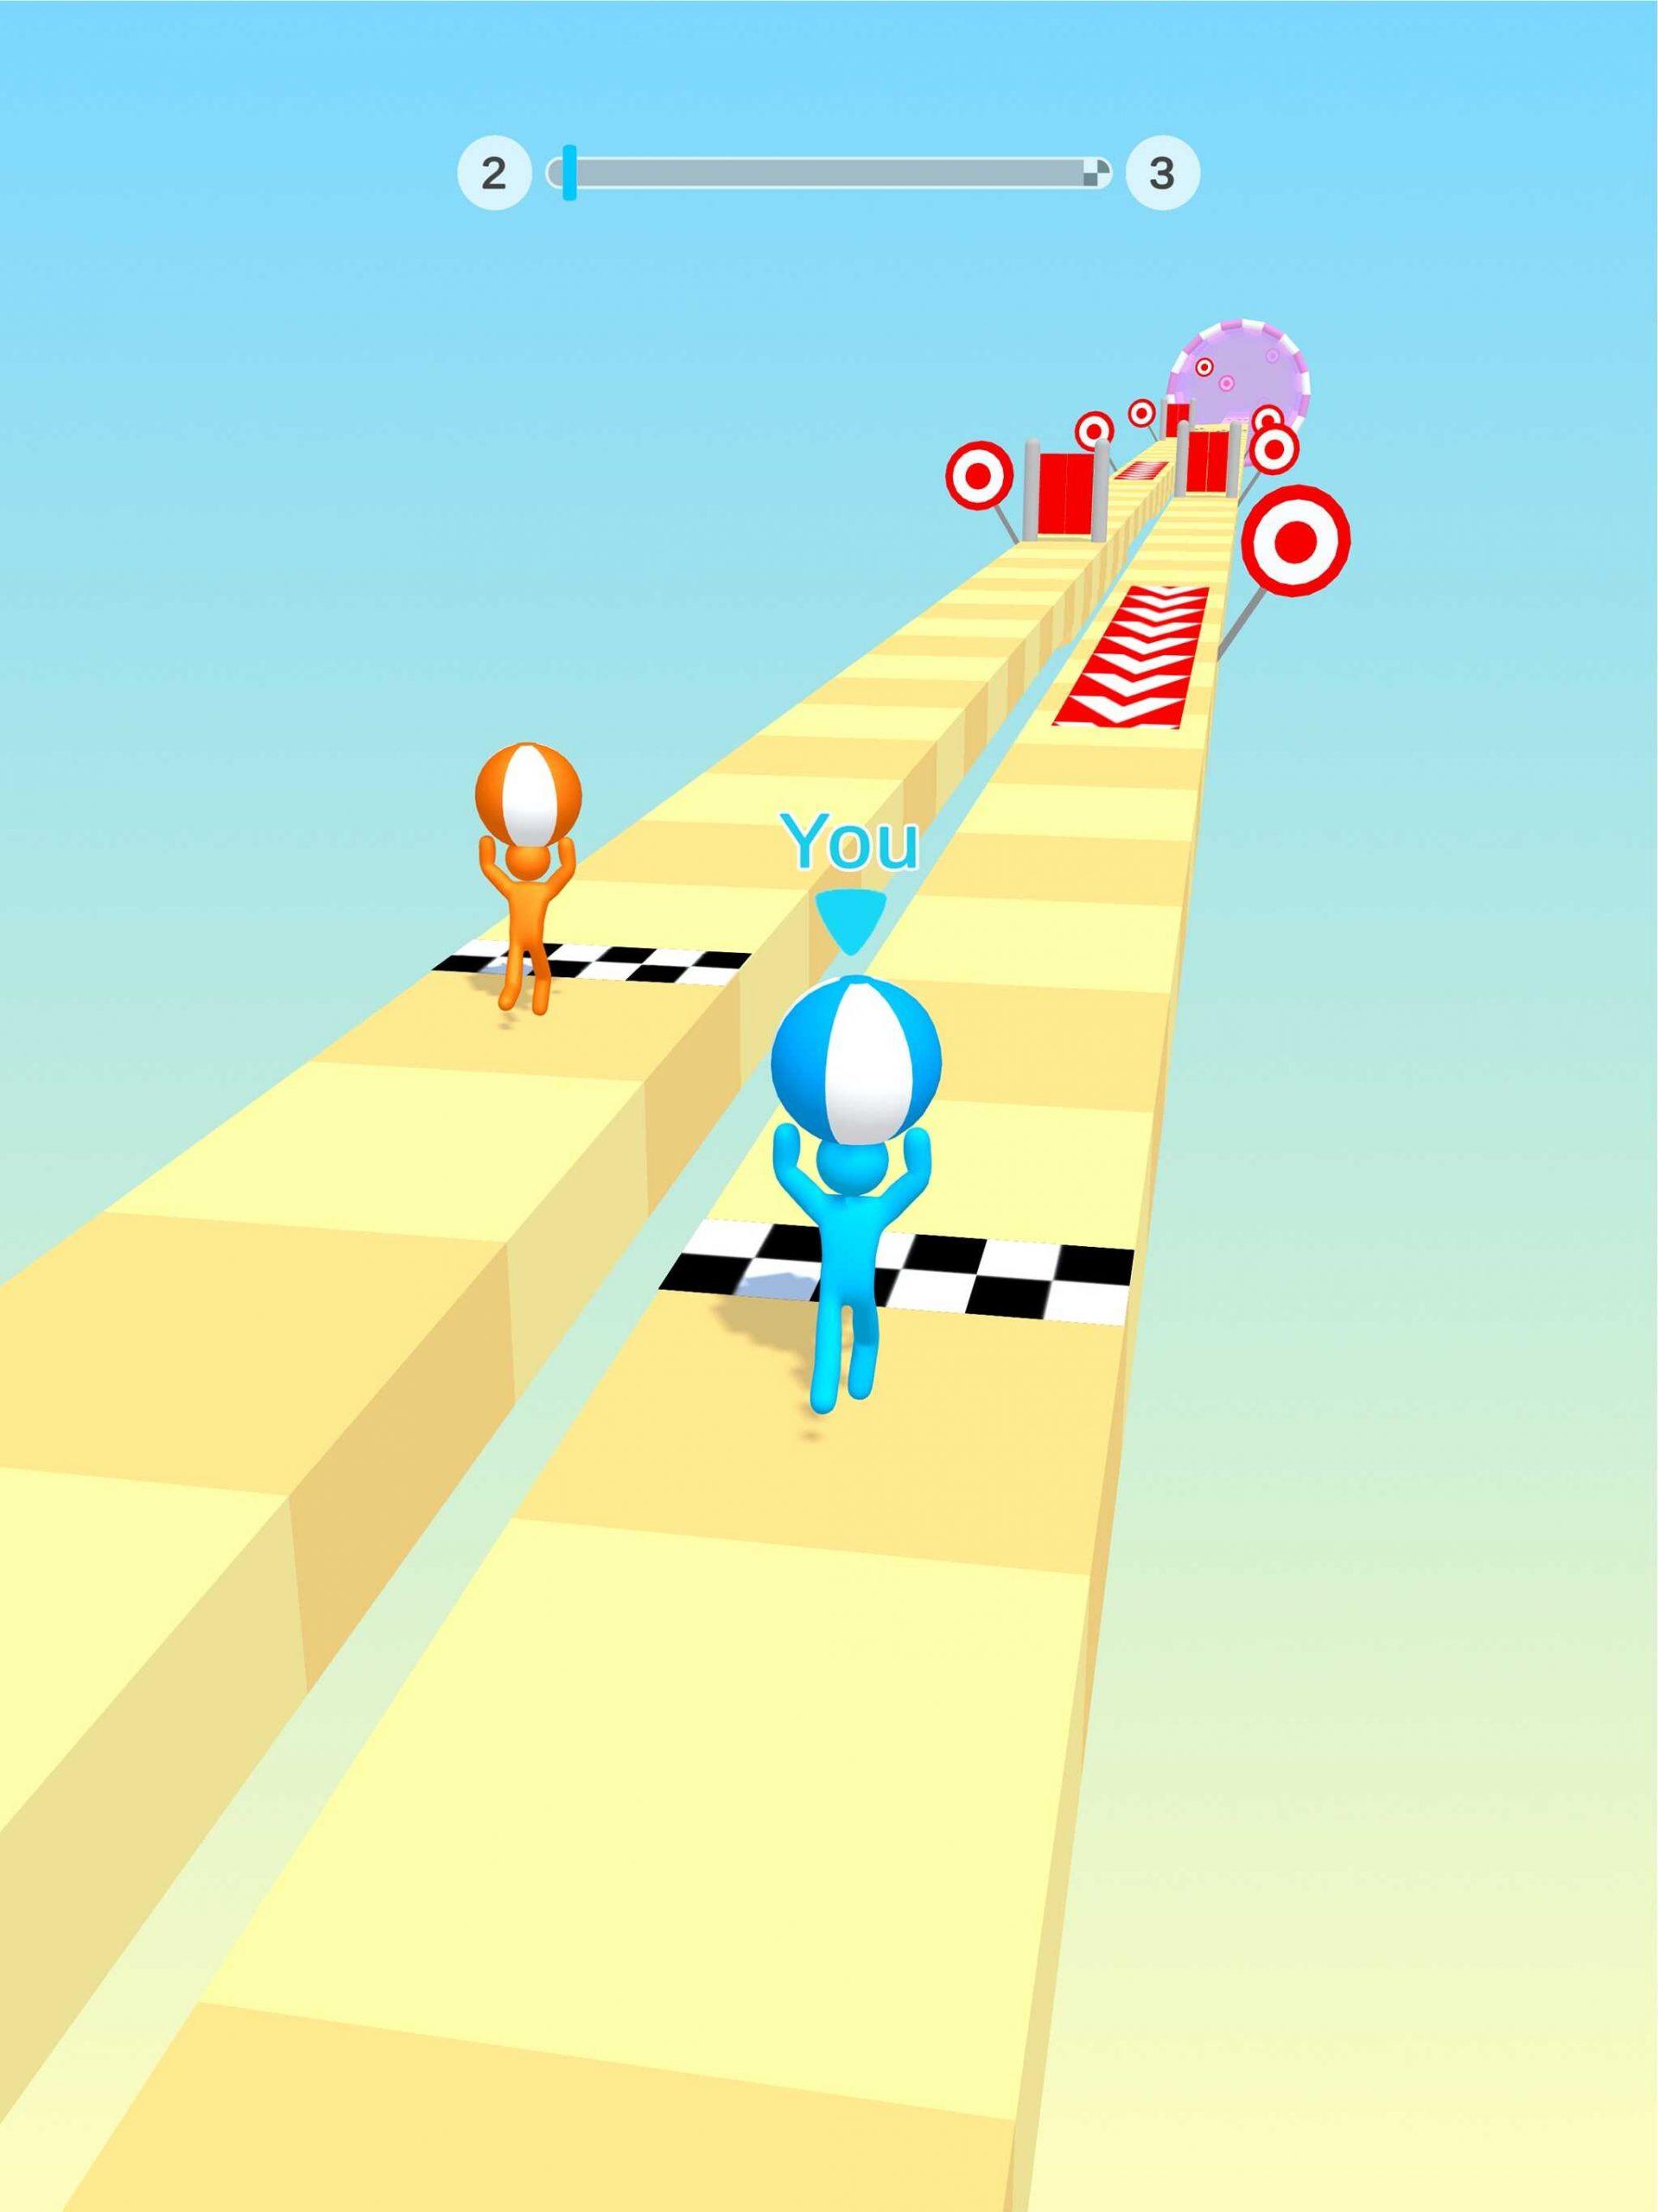 Tricky Track 3Dってどんなハイパーカジュアルゲーム? 遊び方とレビューを公開!